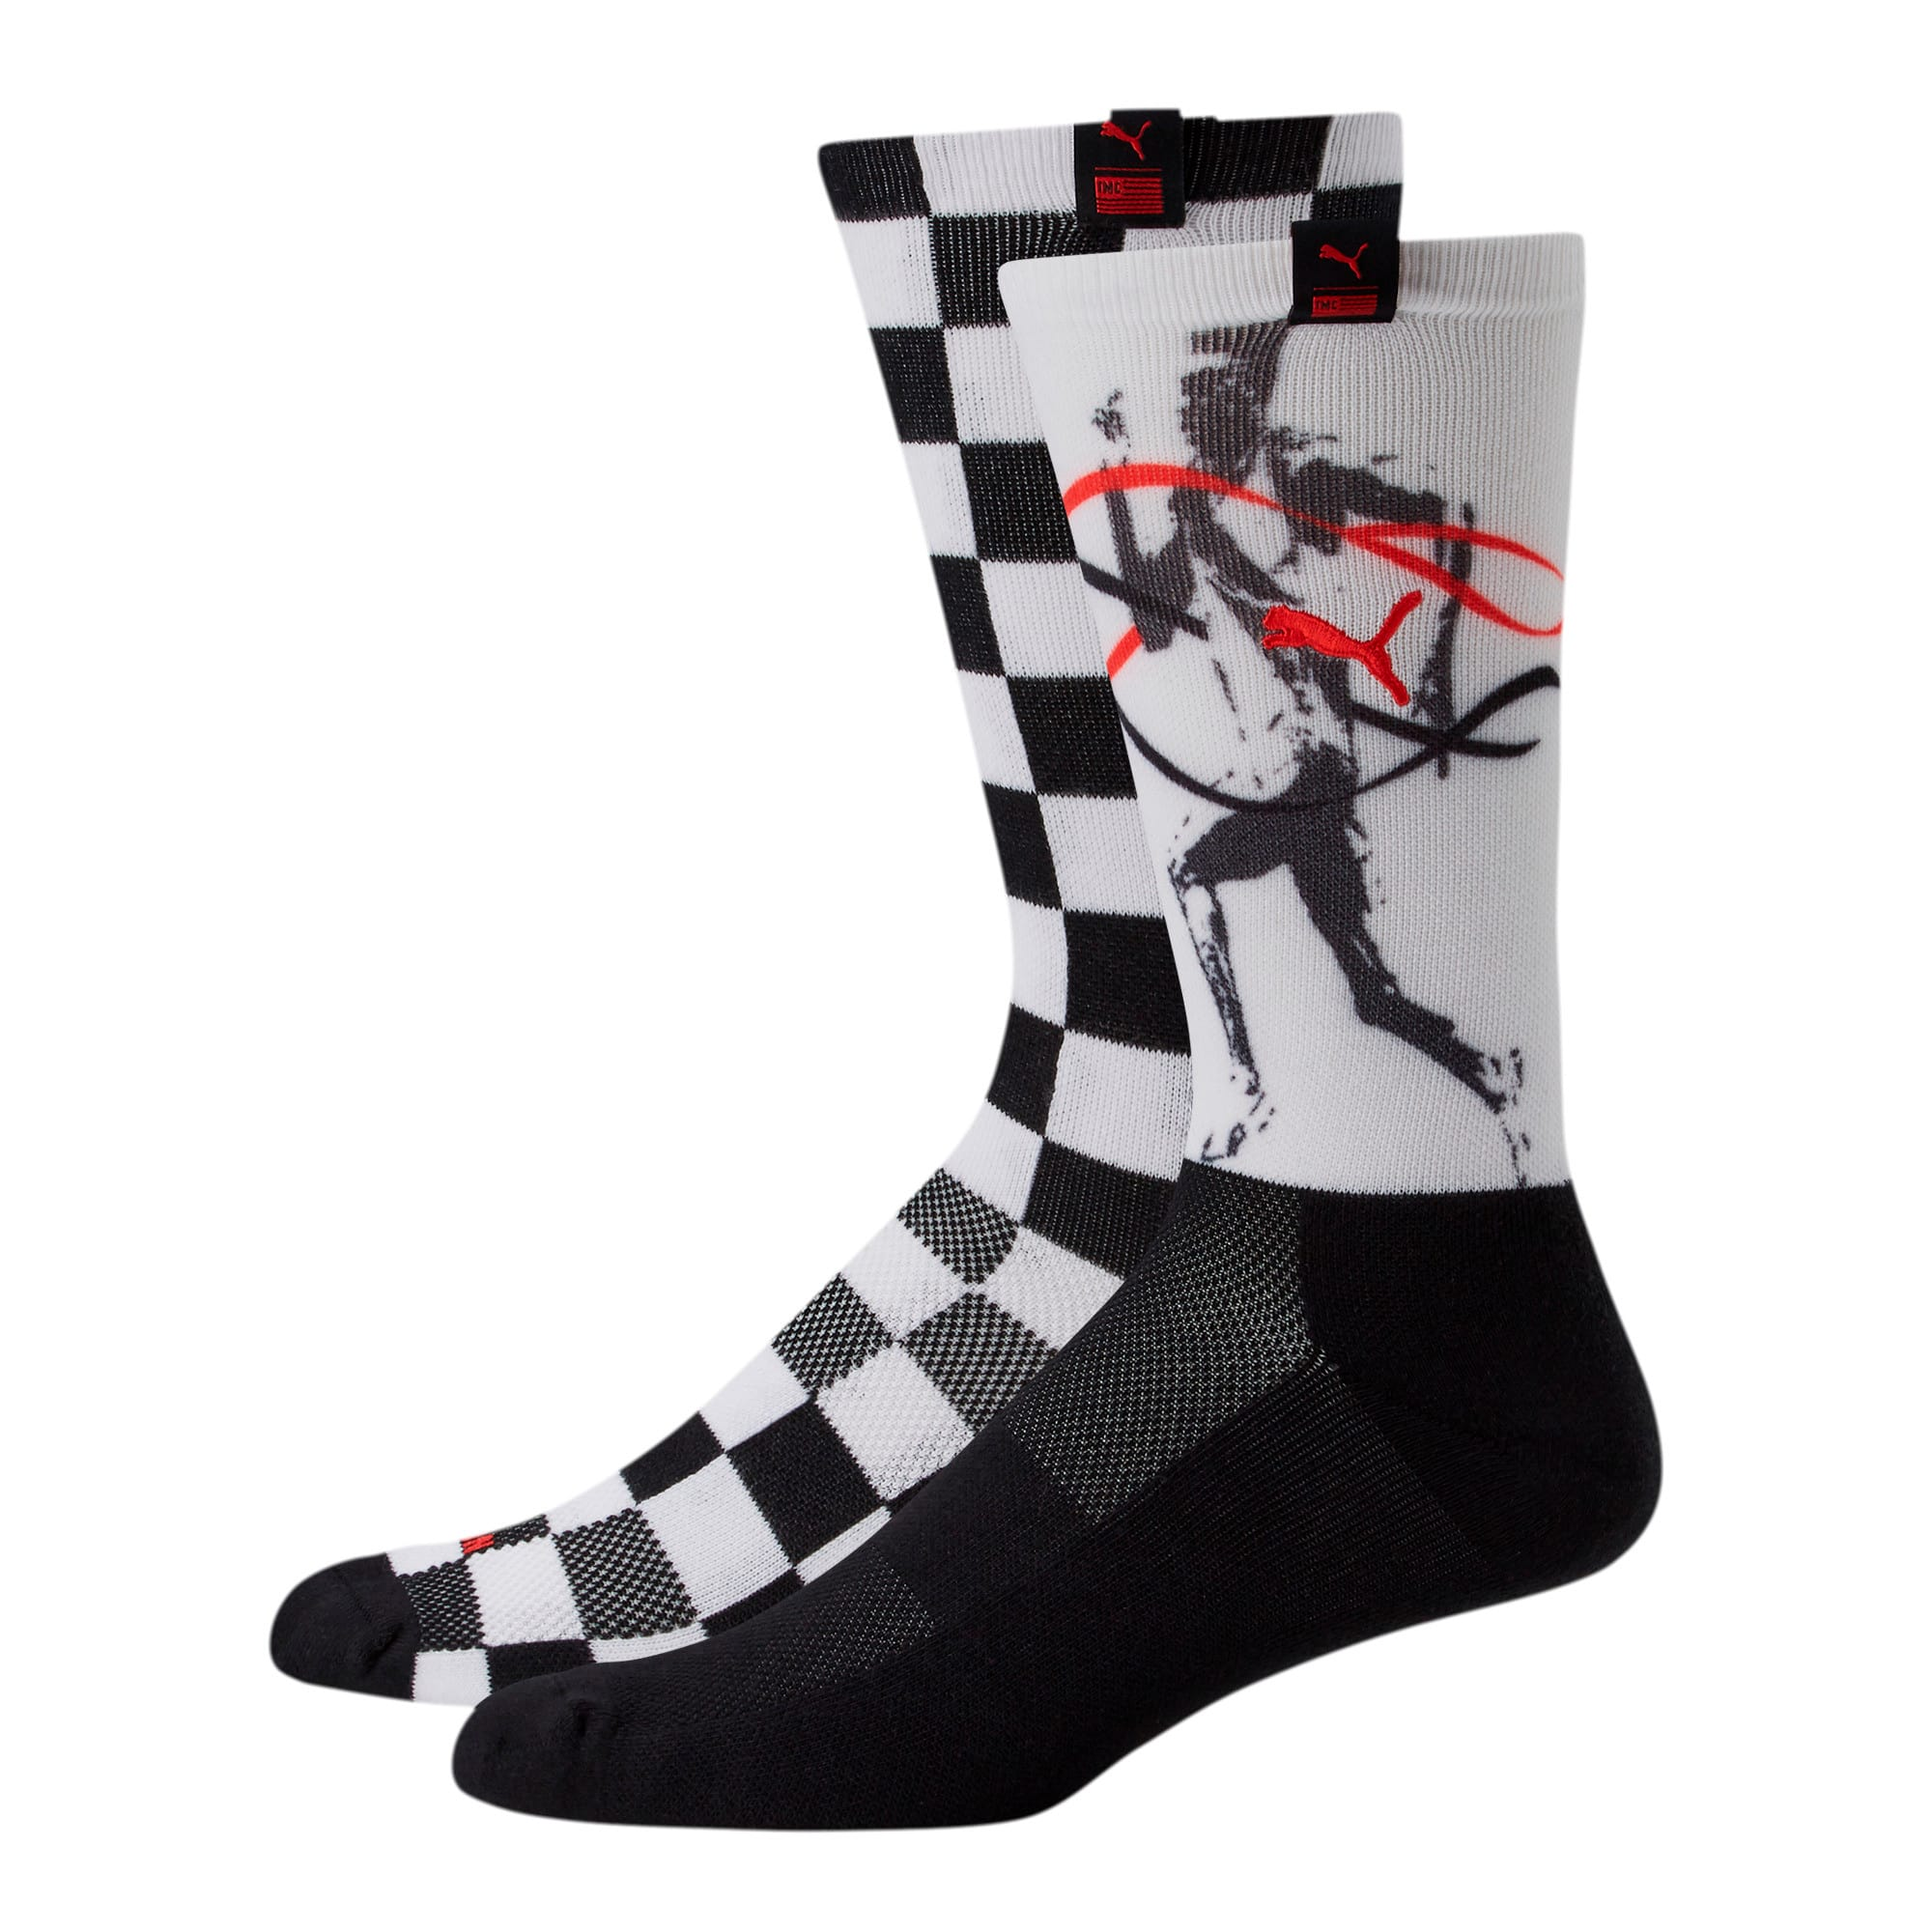 Thumbnail 1 of PUMA x TMC Men's Crew Socks [2 Pack], BLACK / WHITE, medium